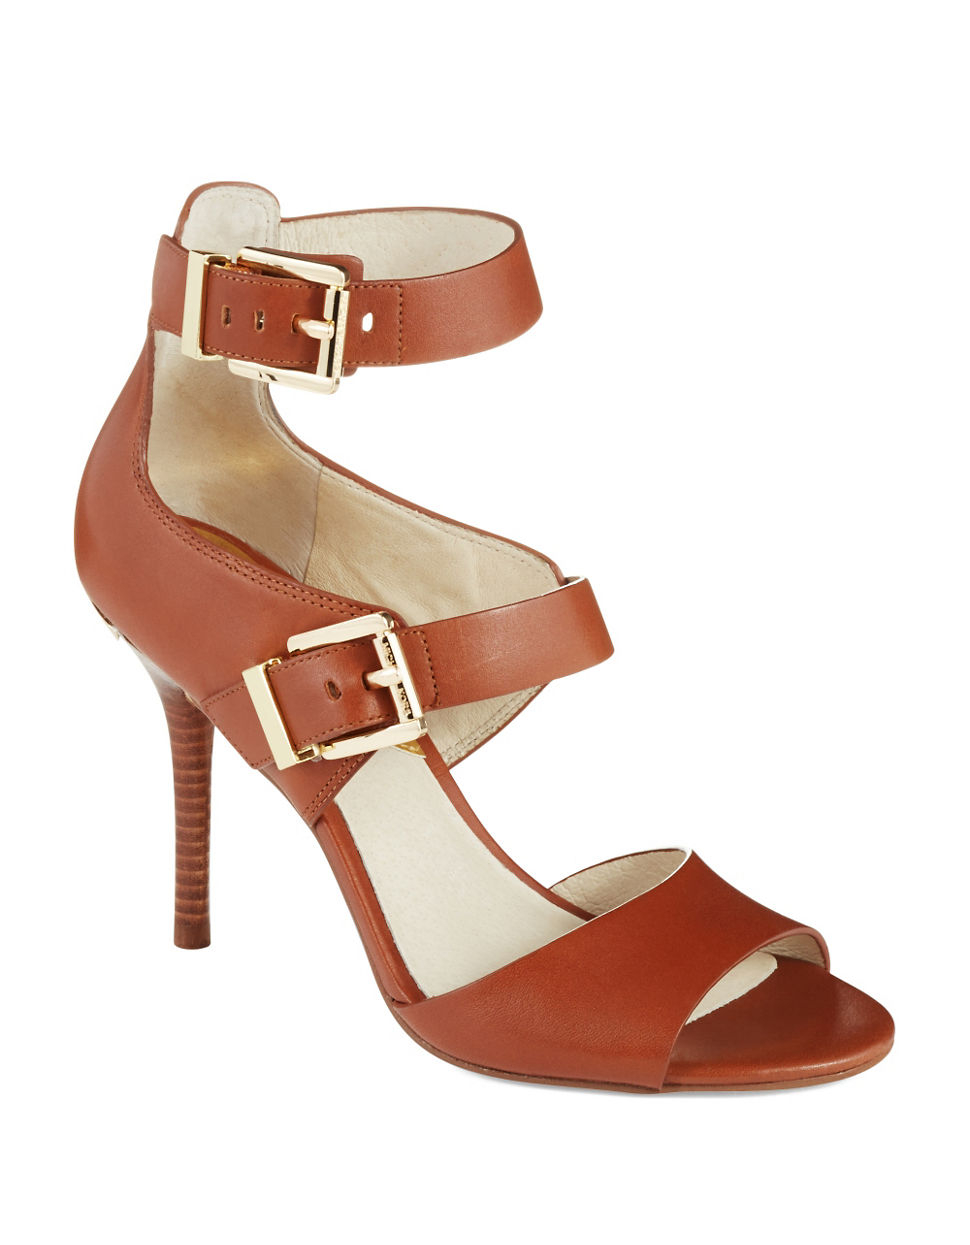 michael michael kors adriana ankle strap heels in brown lyst. Black Bedroom Furniture Sets. Home Design Ideas